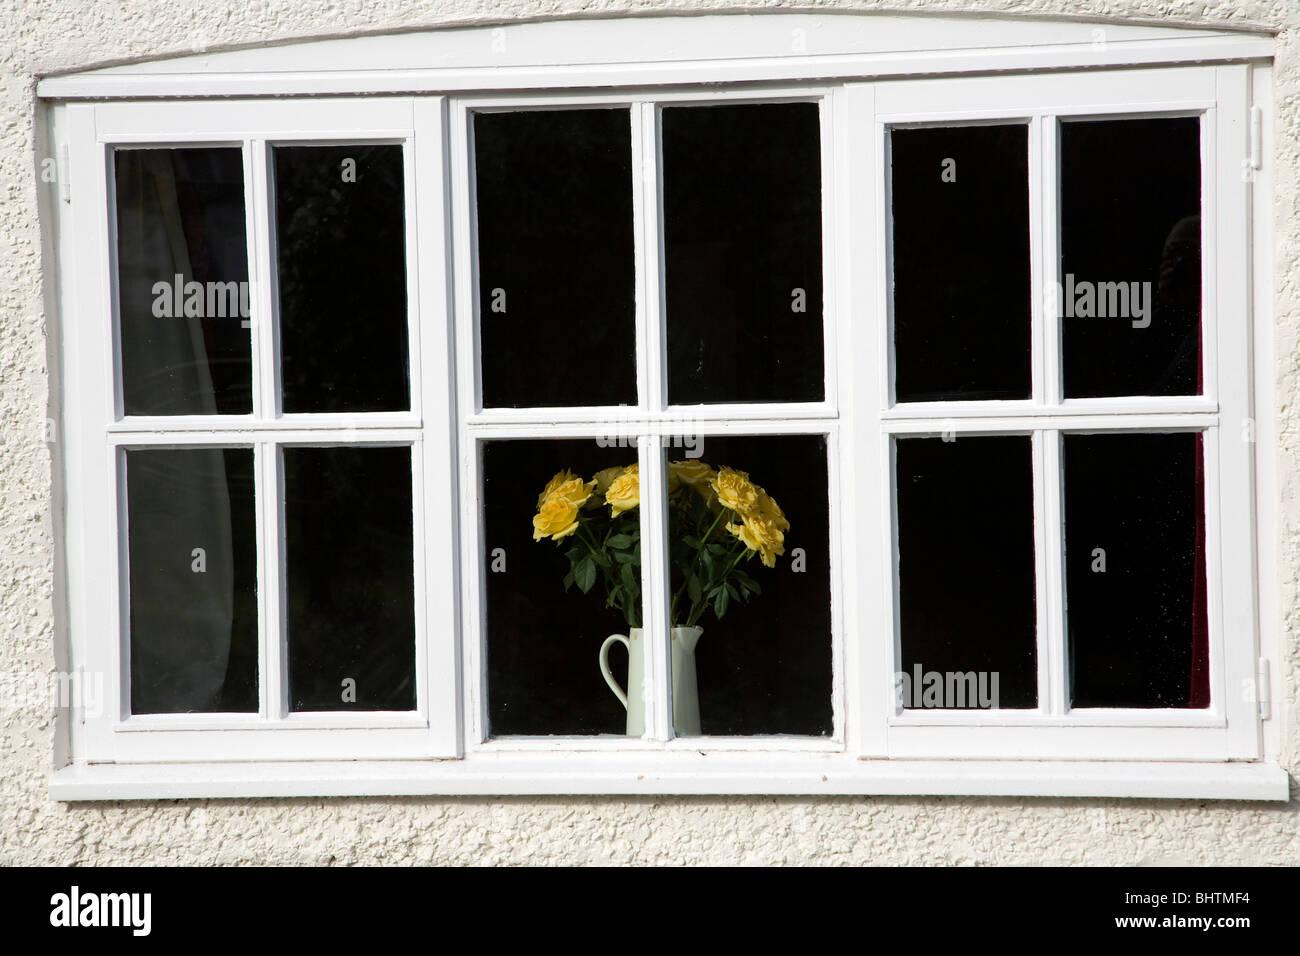 Yellow roses in vase on windowsill - Stock Image